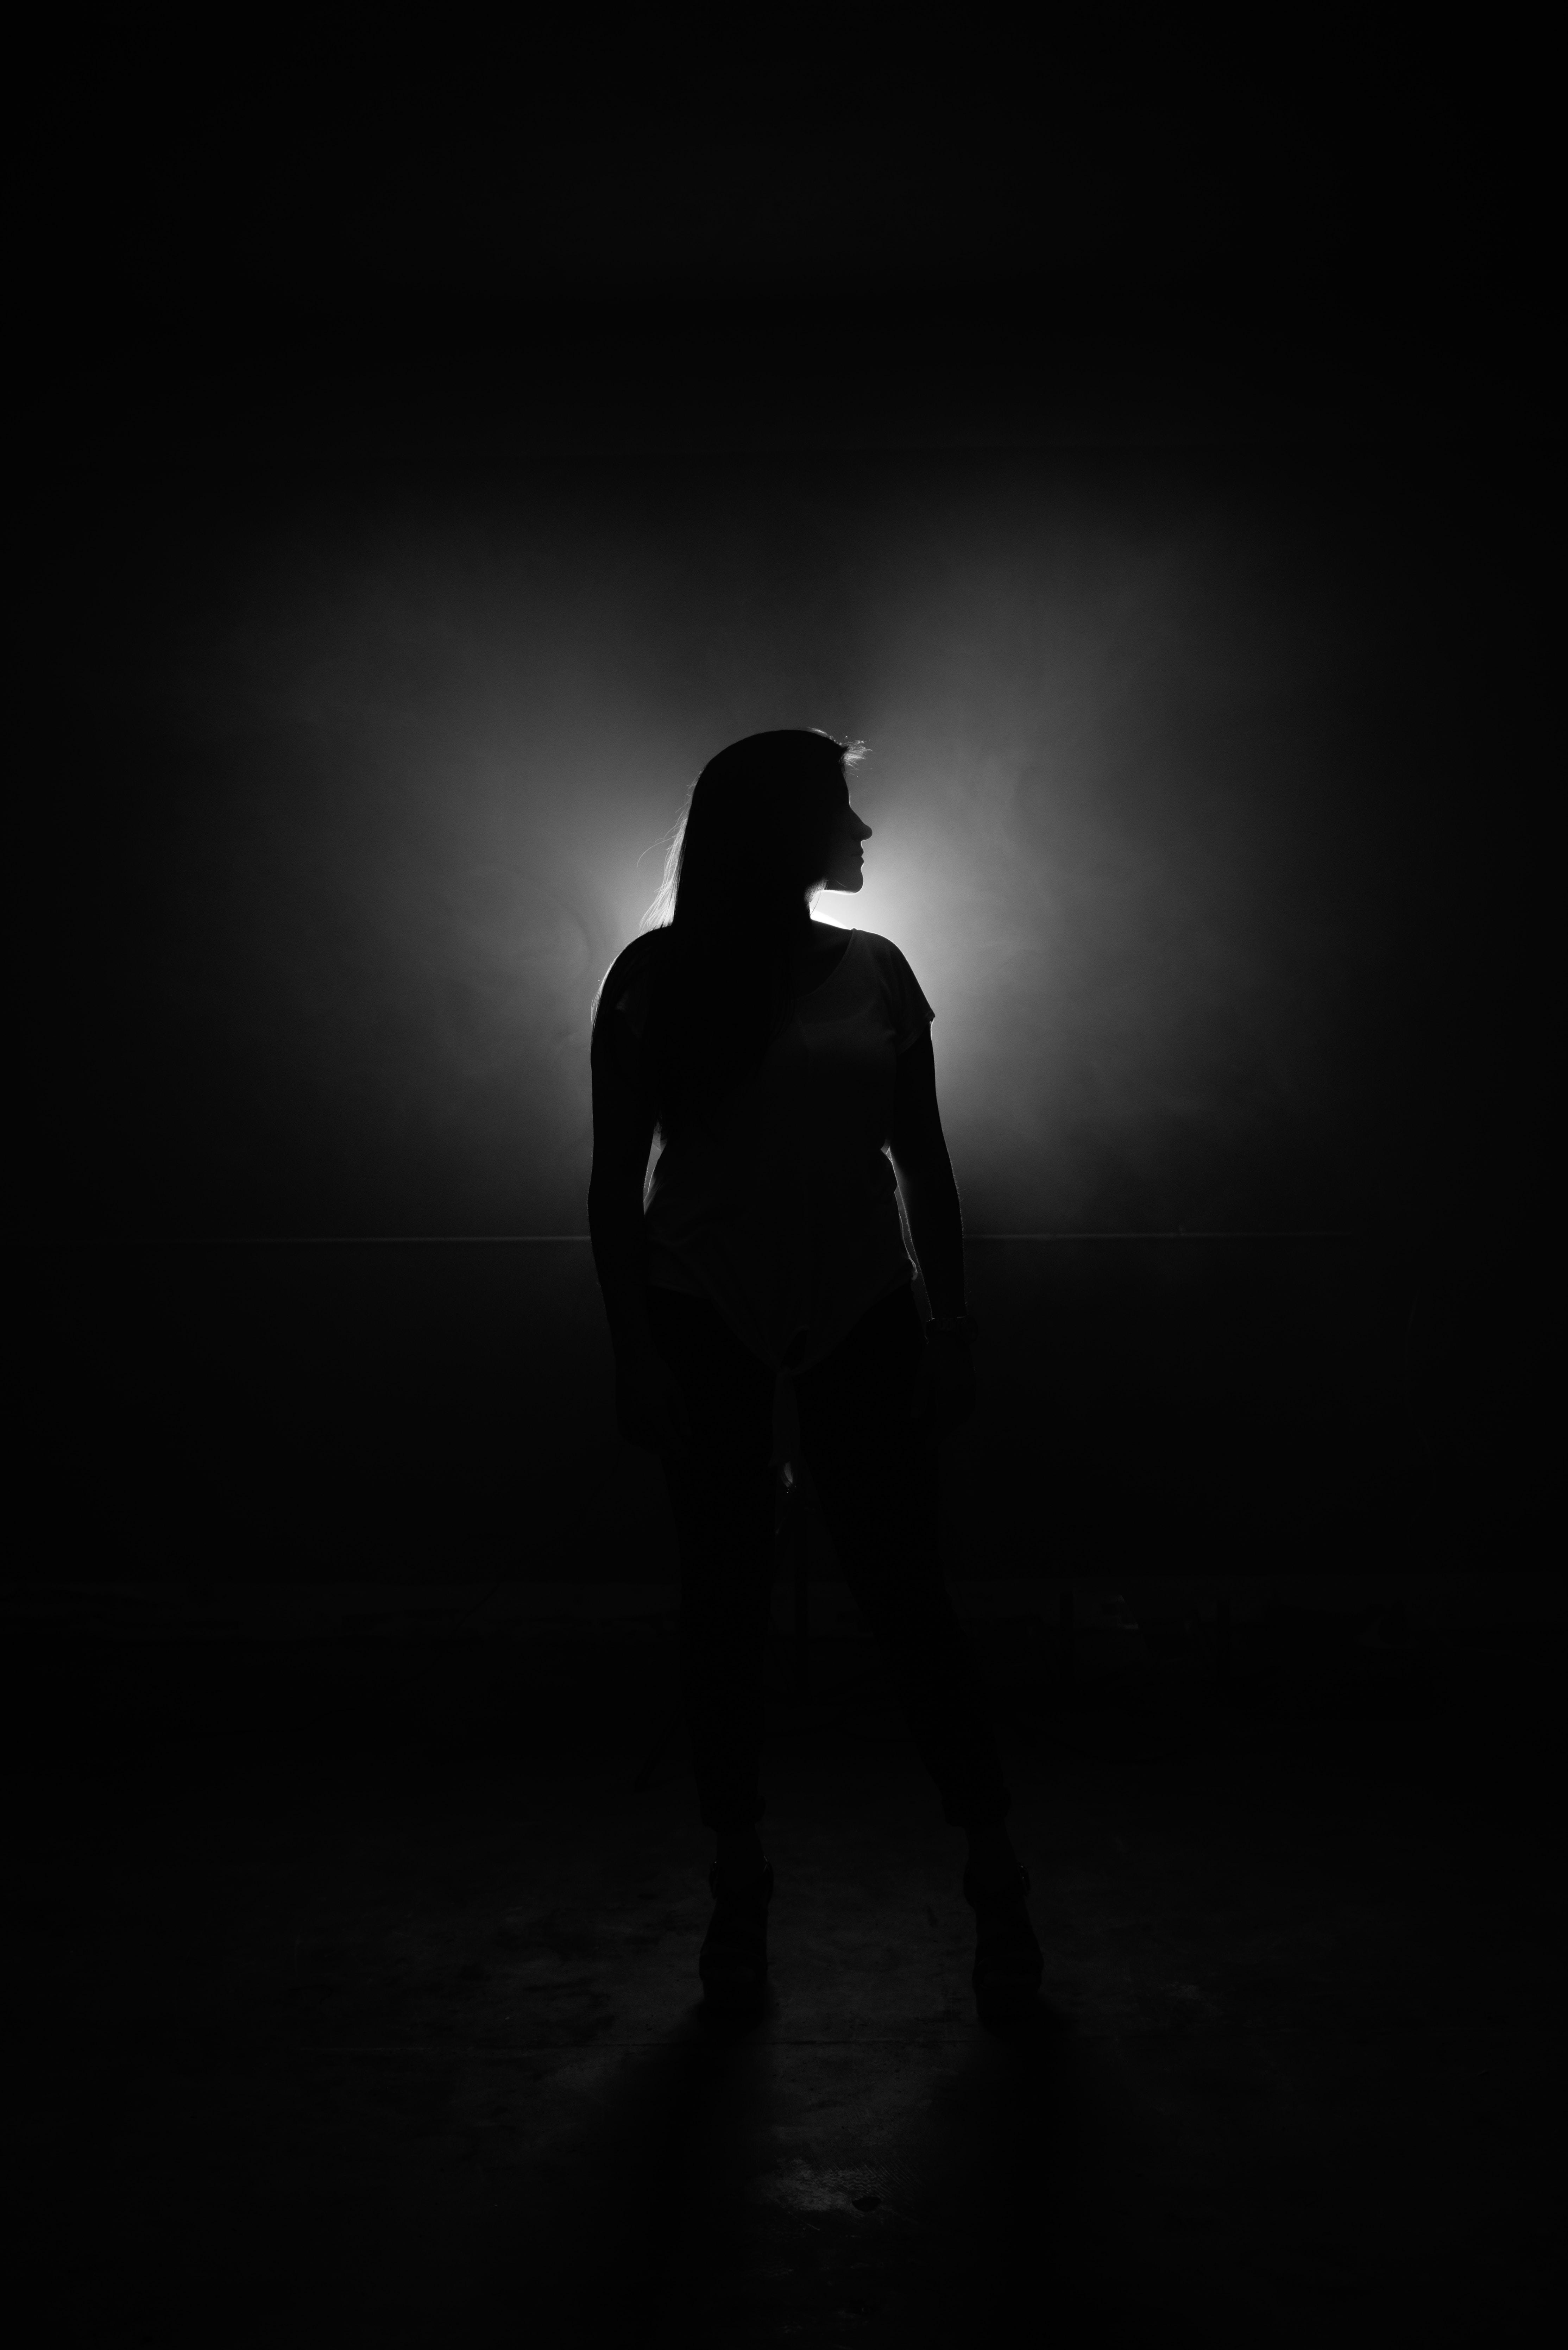 woman's shadow